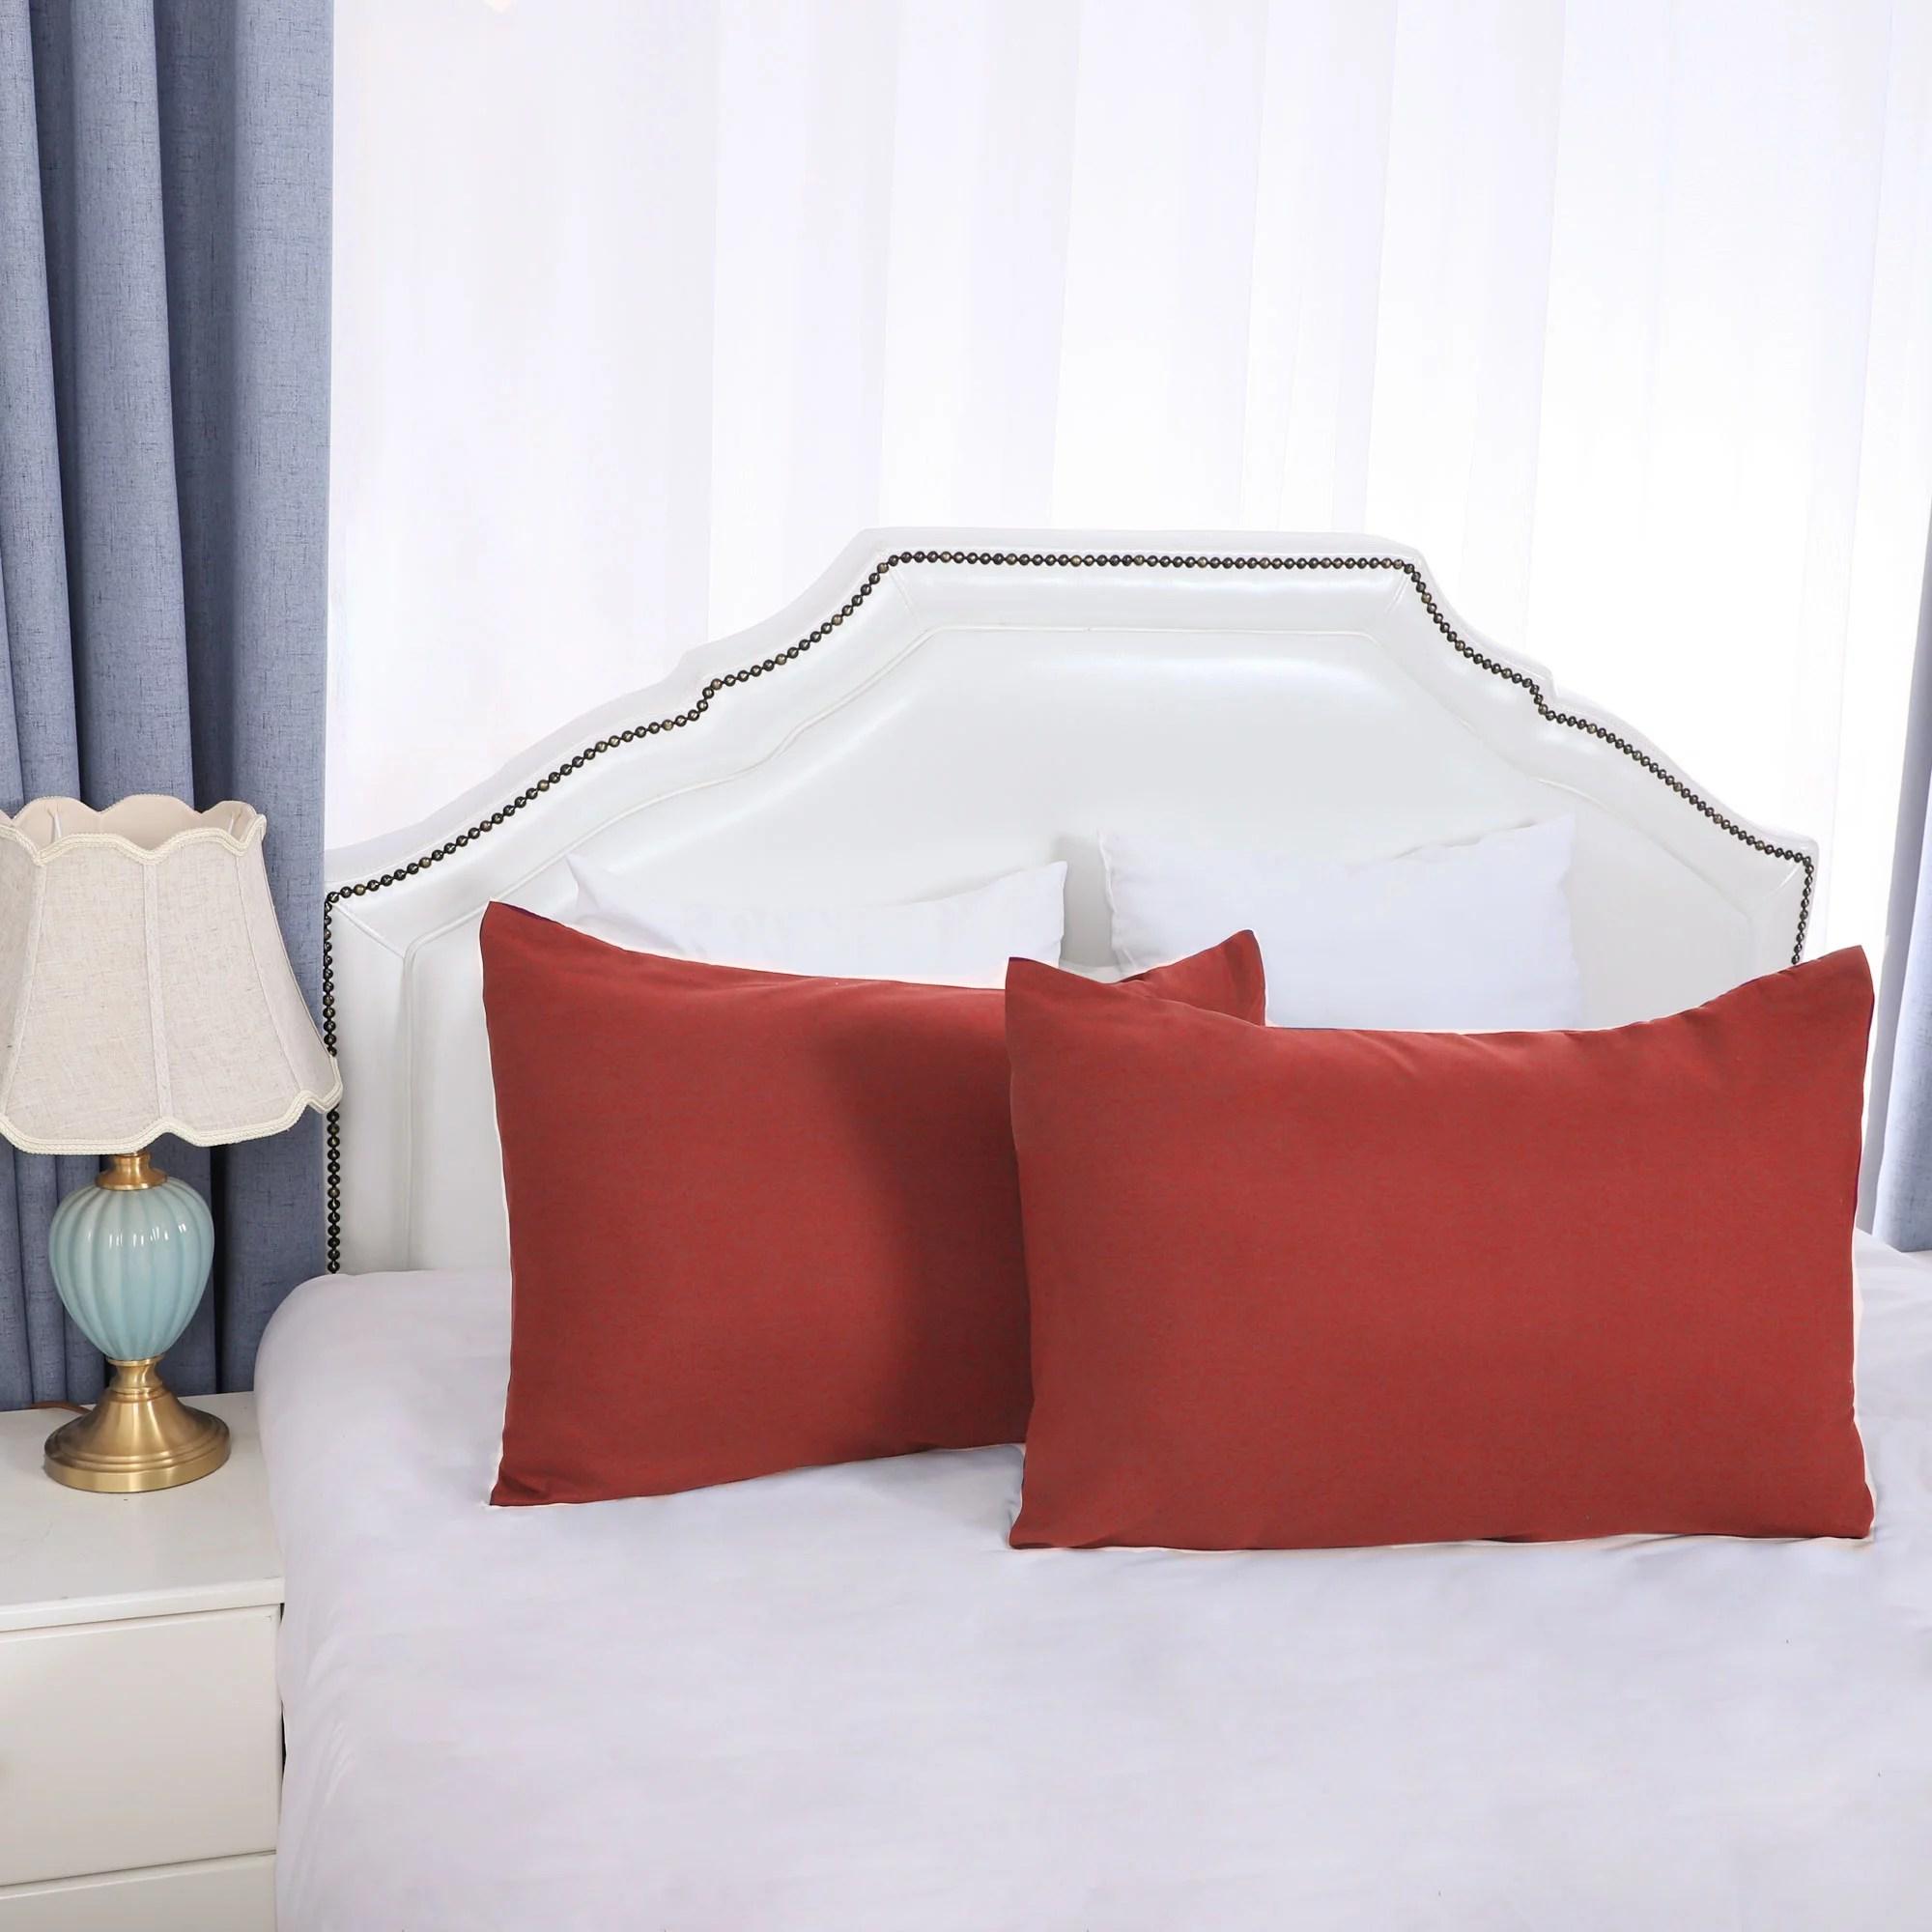 2 pack travel size pillowcases soft 1800 microfiber pillow case with envelope closure orange bedding pillow covers walmart com